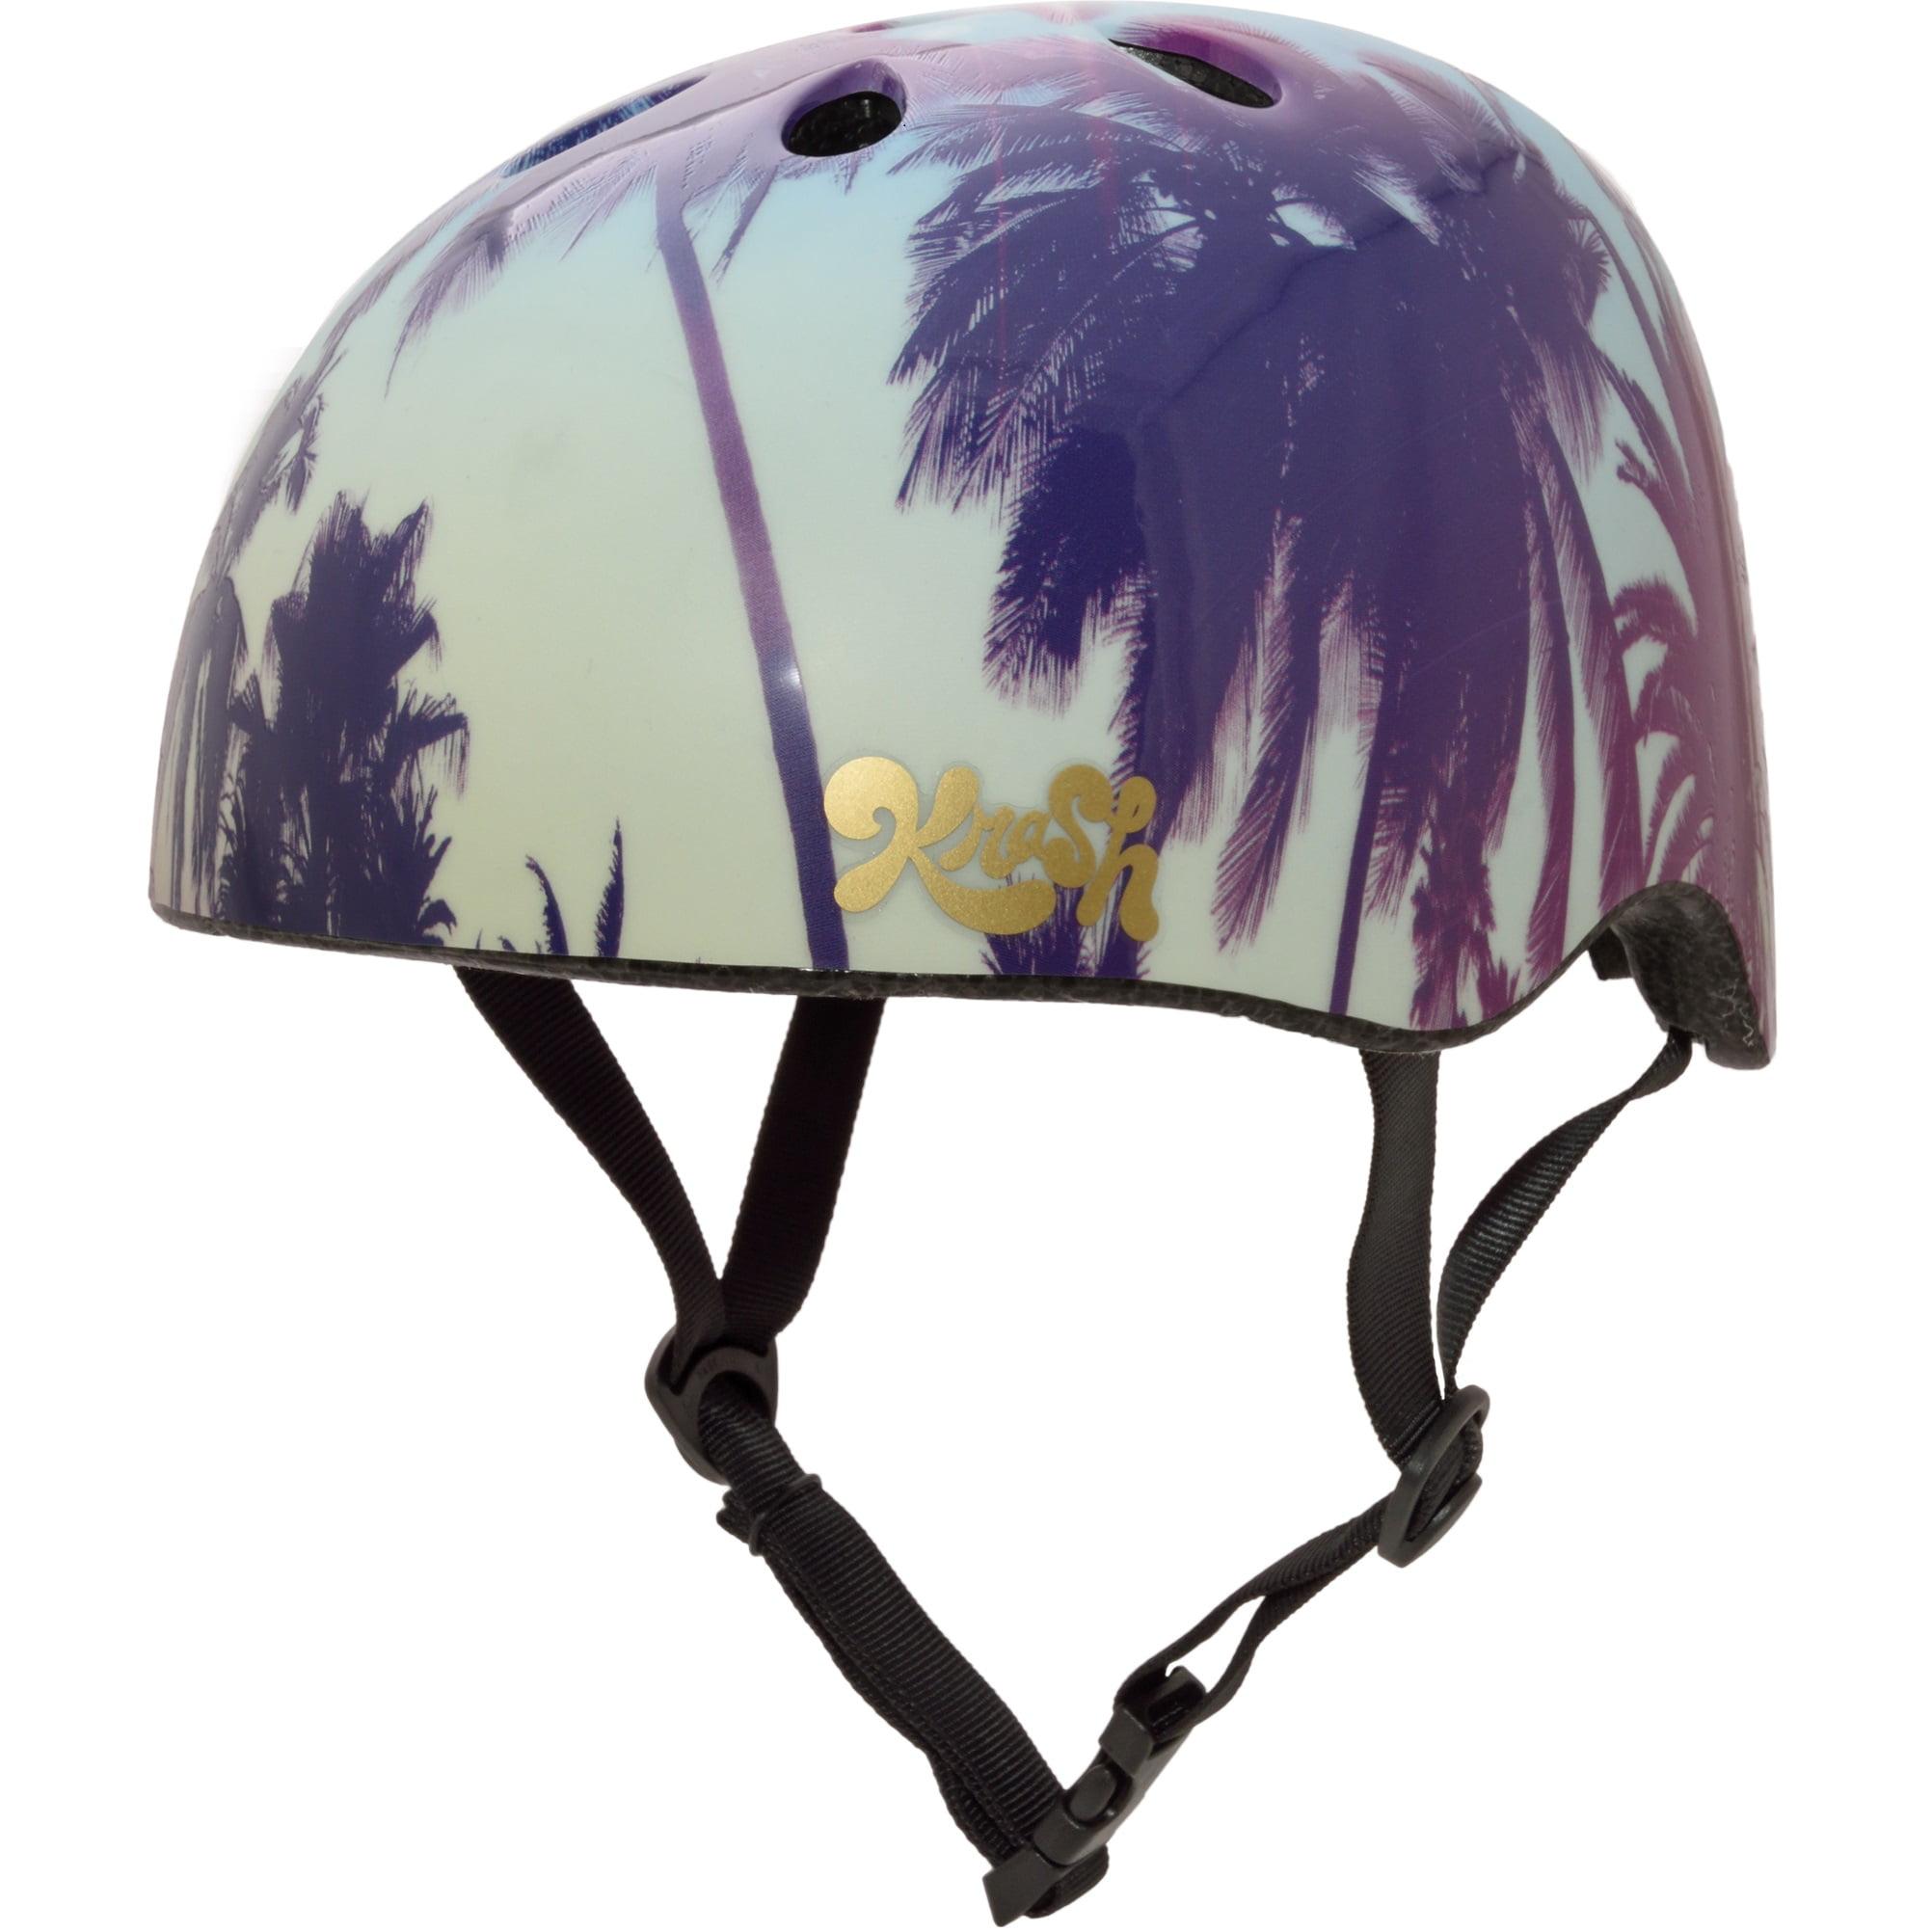 Krash! Palm Trees Helmet, Youth 8+ (54-58cm)